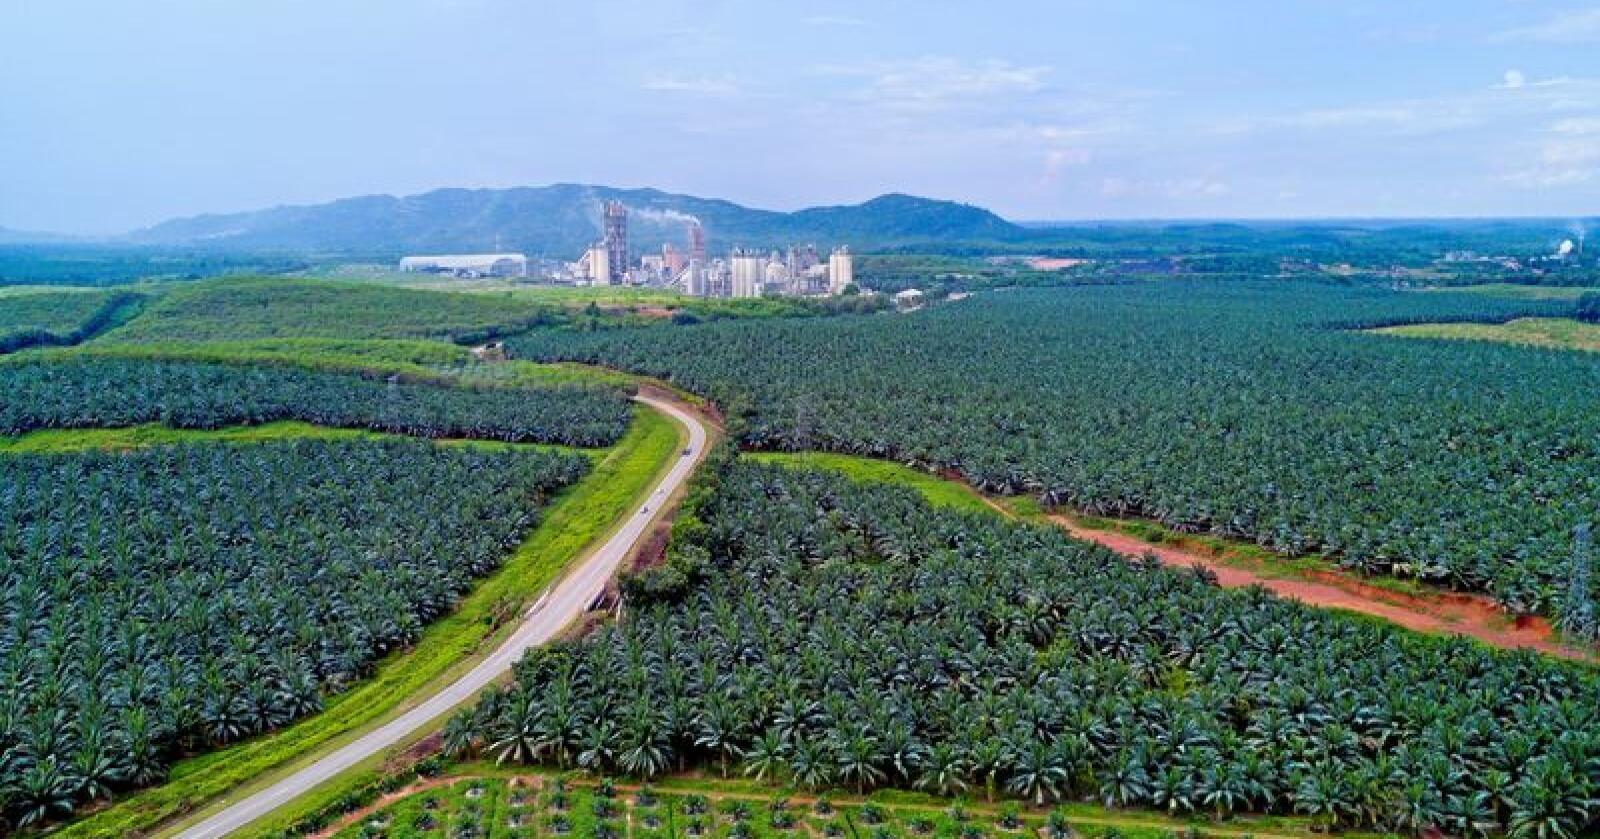 Indonesia og Malaysia produserer mesteparten av palmeolja i verda, i store plantasjar som på biletet. Foto: Nelza Jamal / Mostphotos